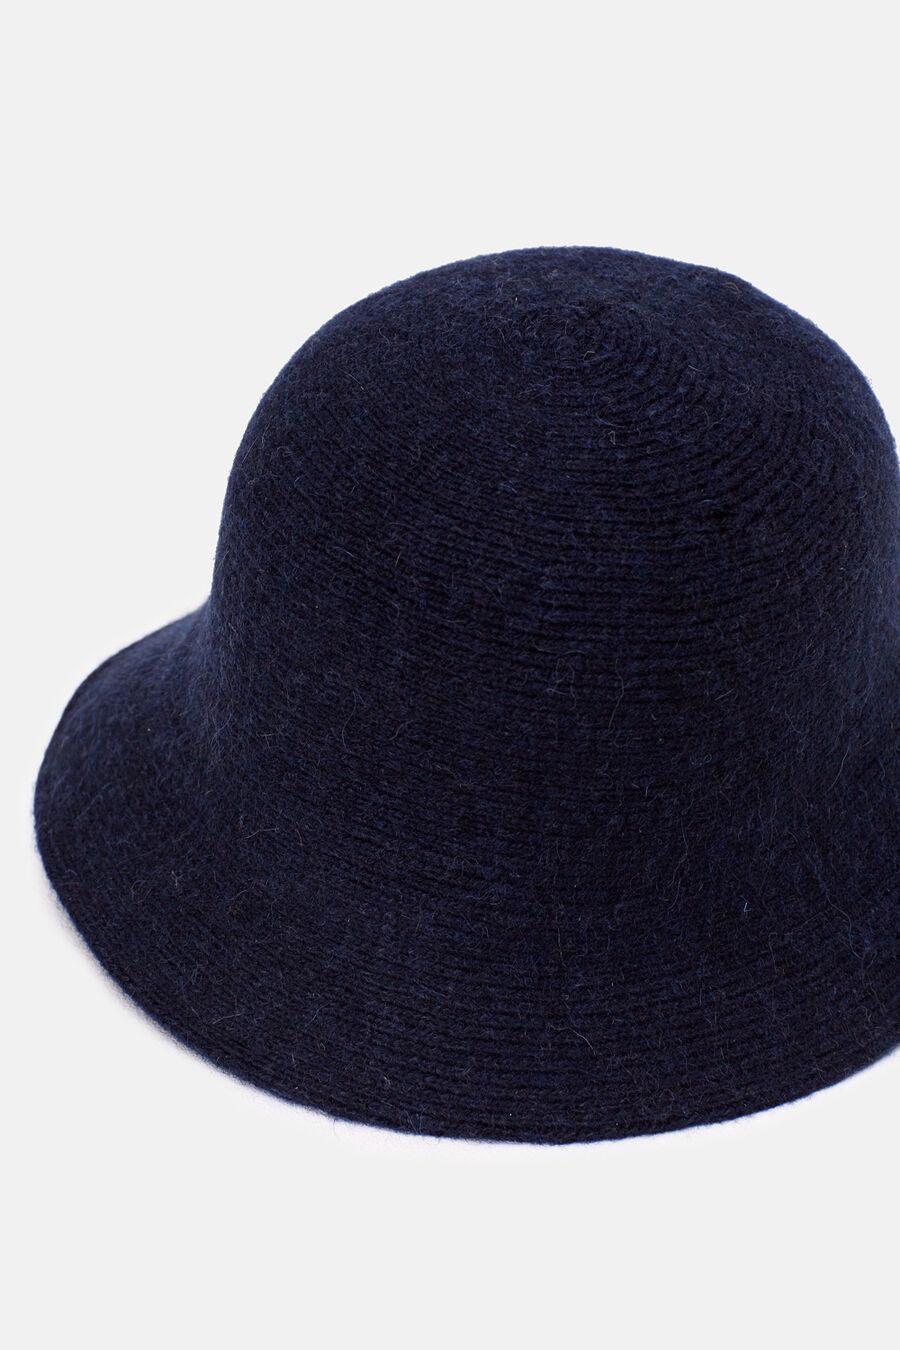 Narrow-brimmed hat